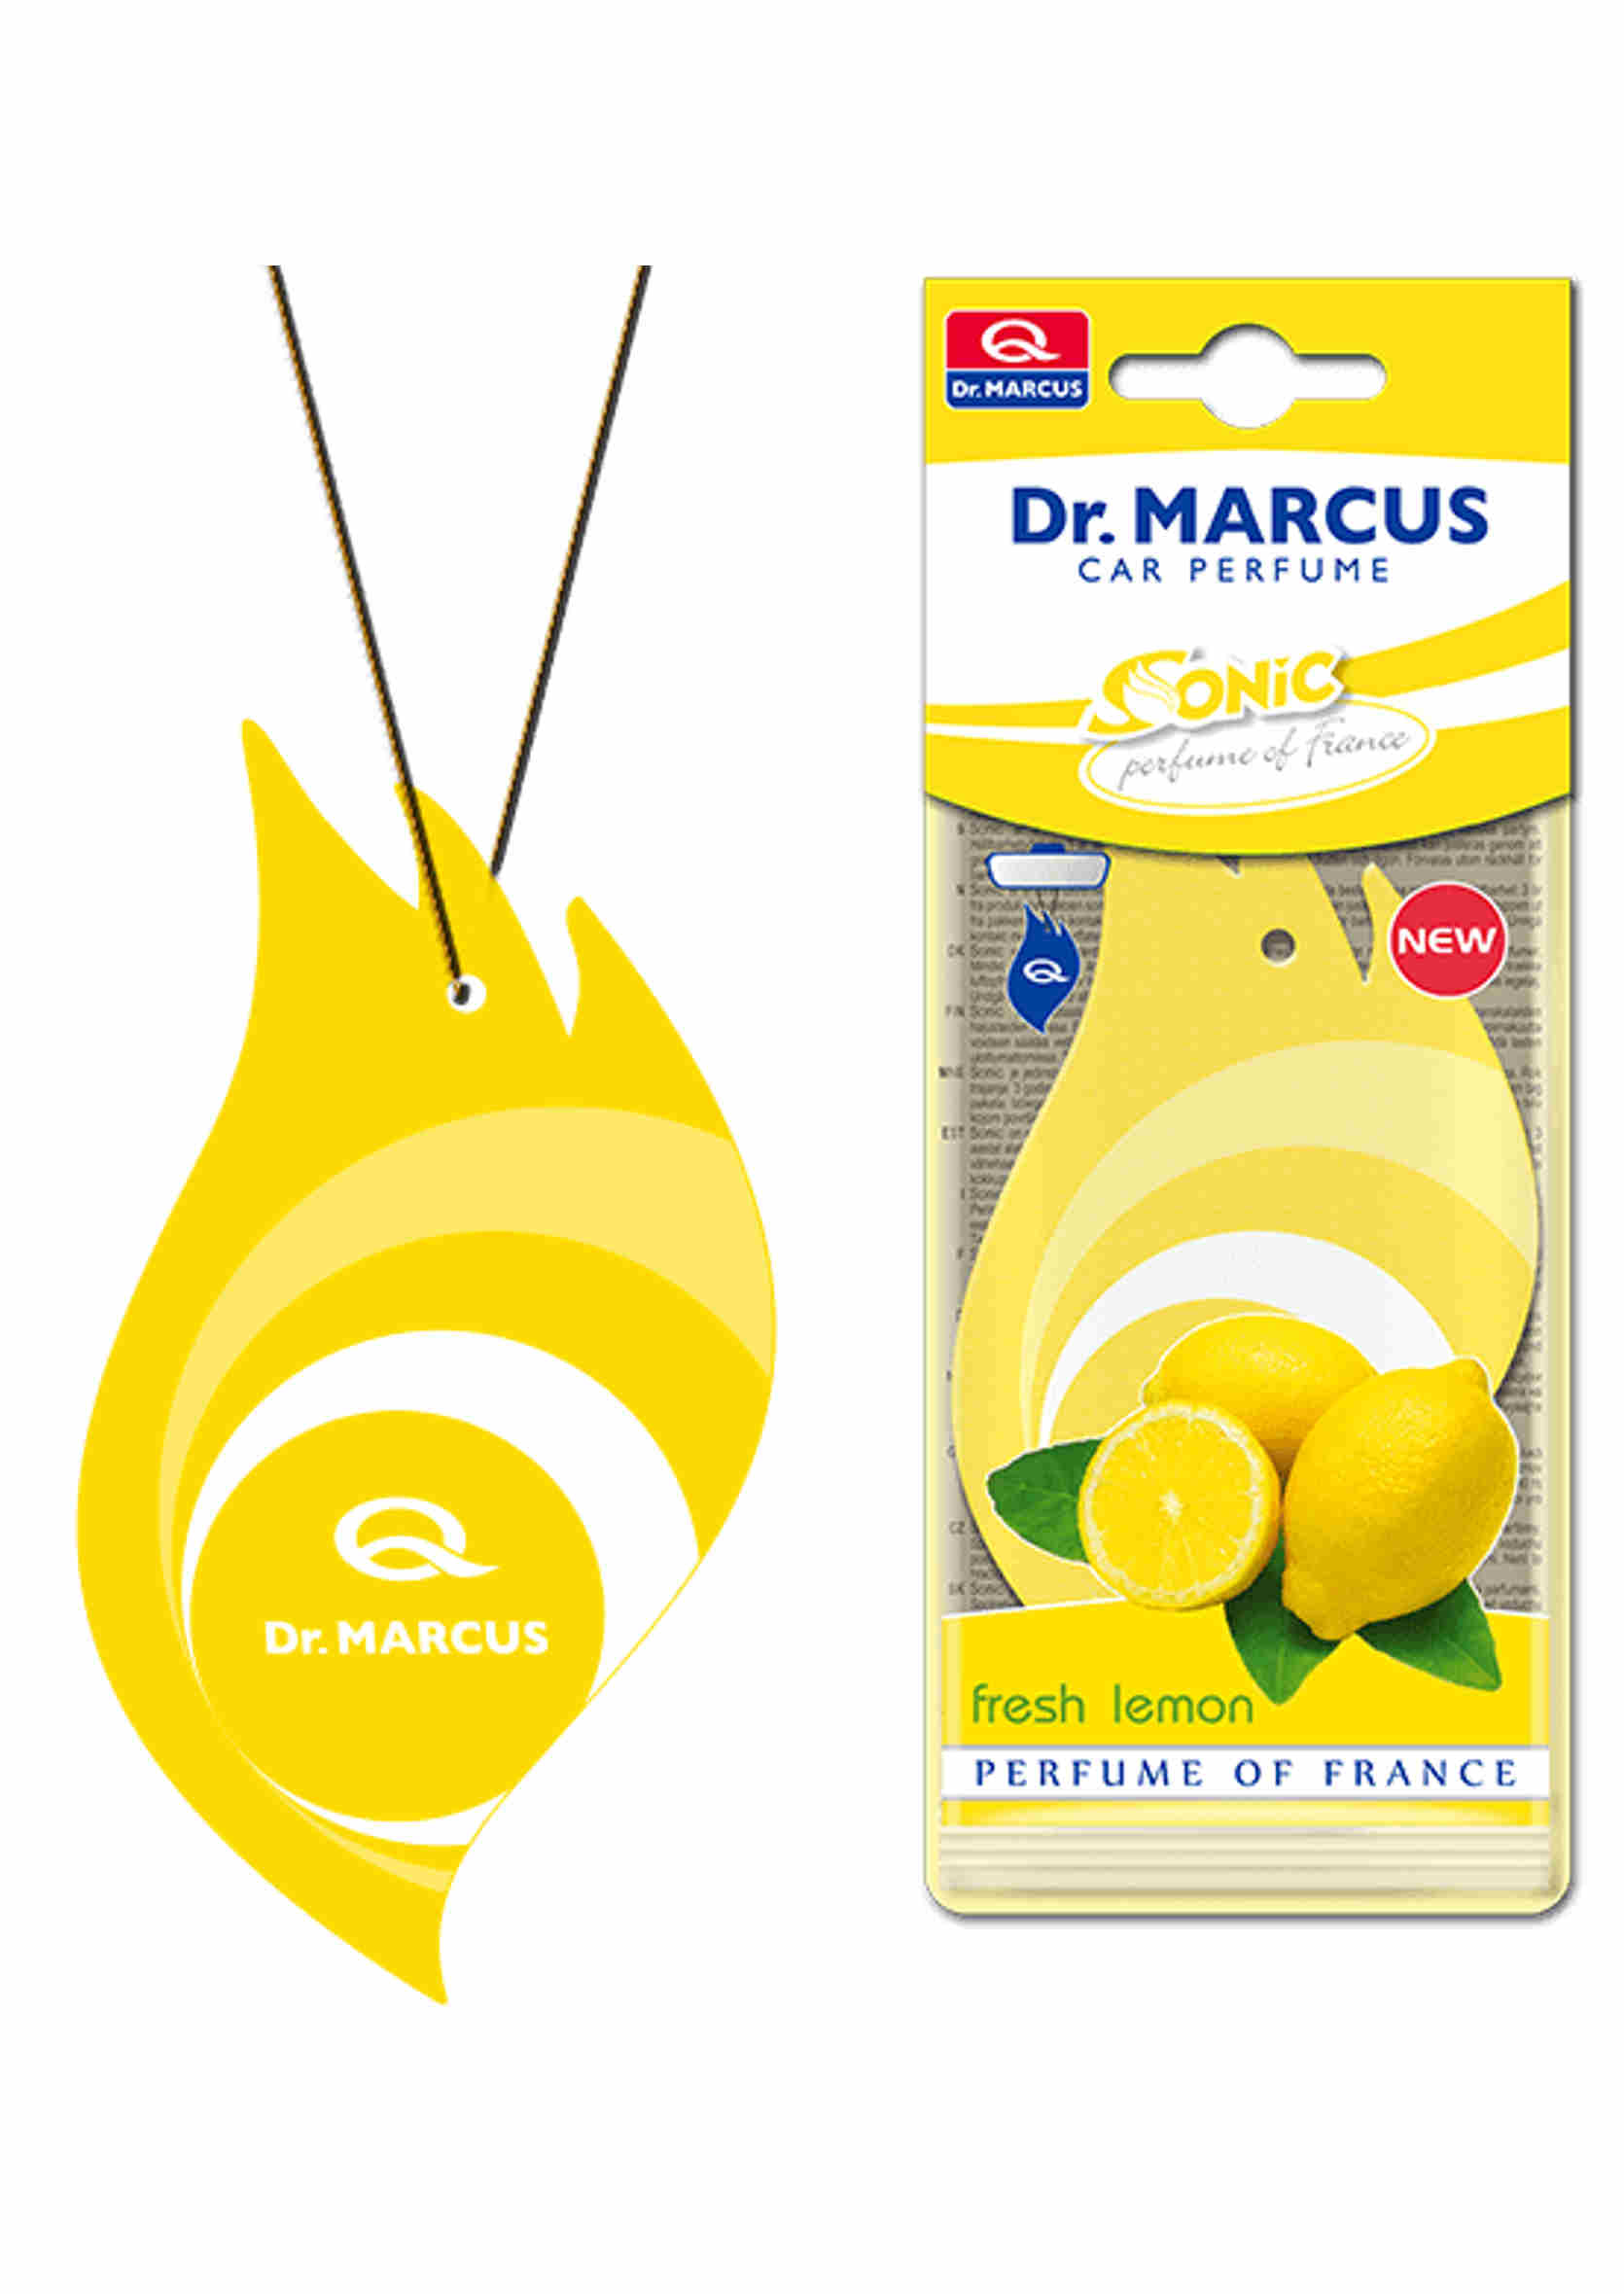 Dr. Marcus Sonic - Drzewko Zapachowe Fresh Lemon